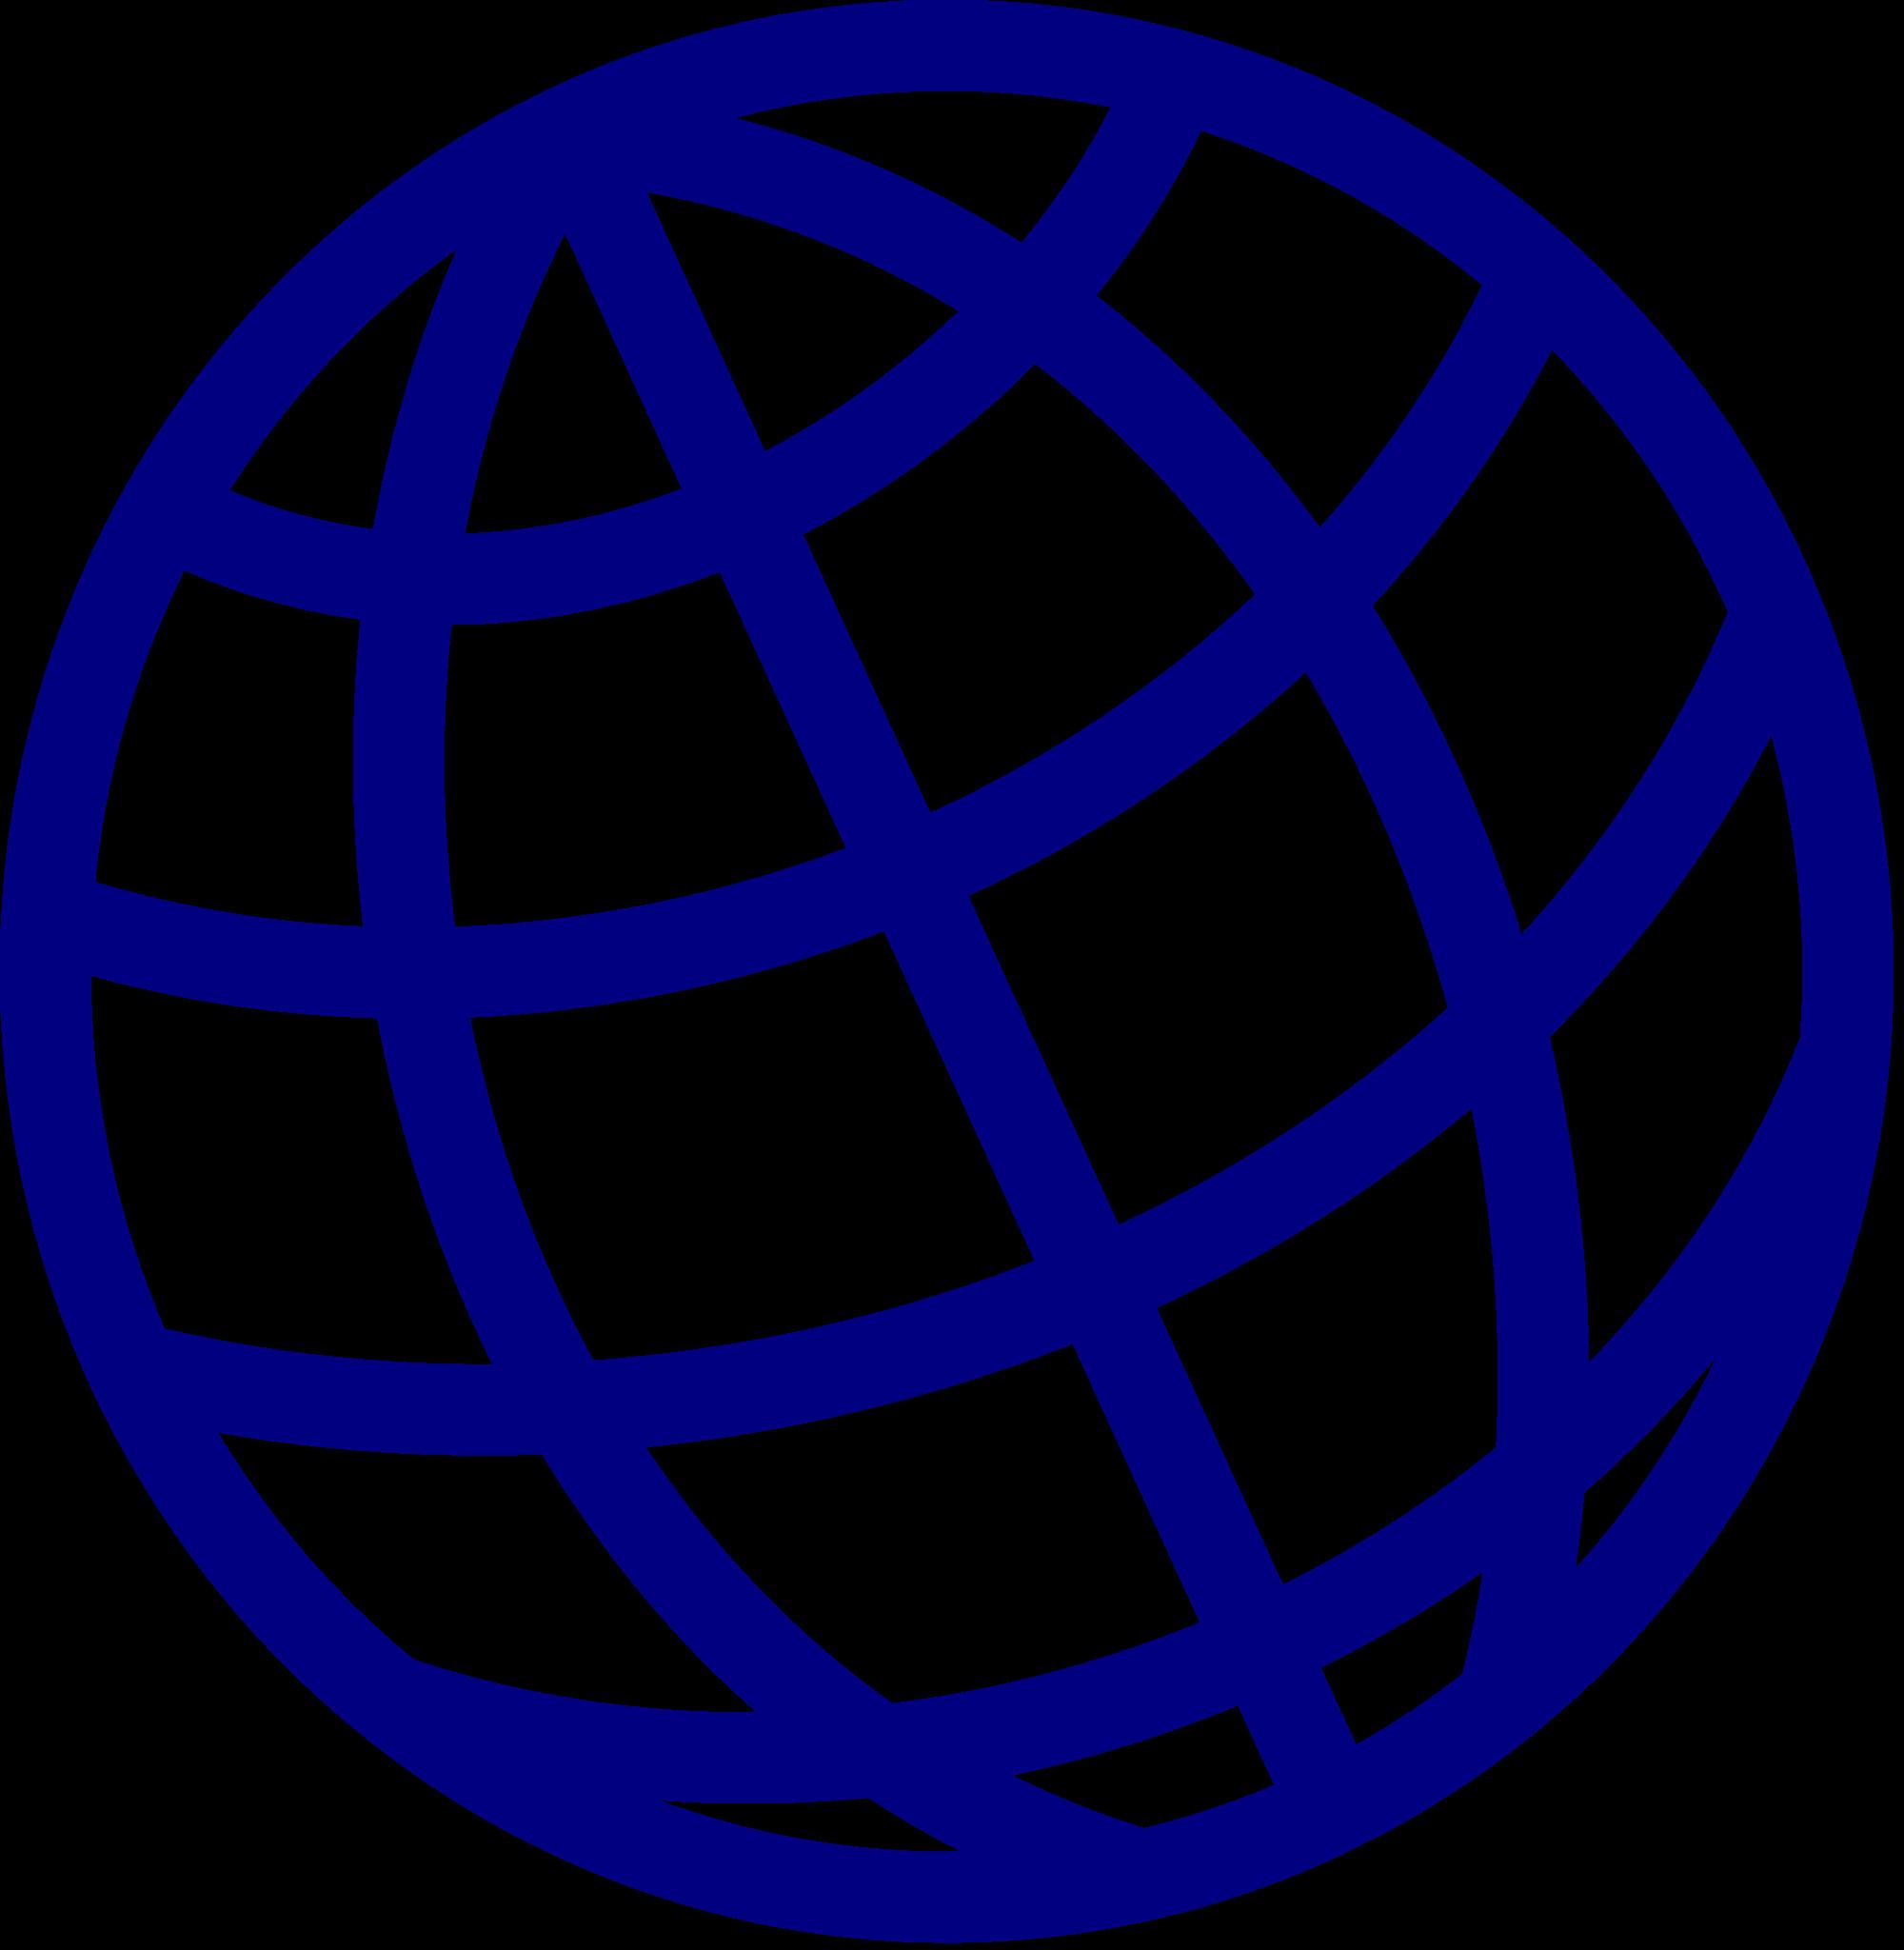 Globe icon png. File blue svg wikimedia